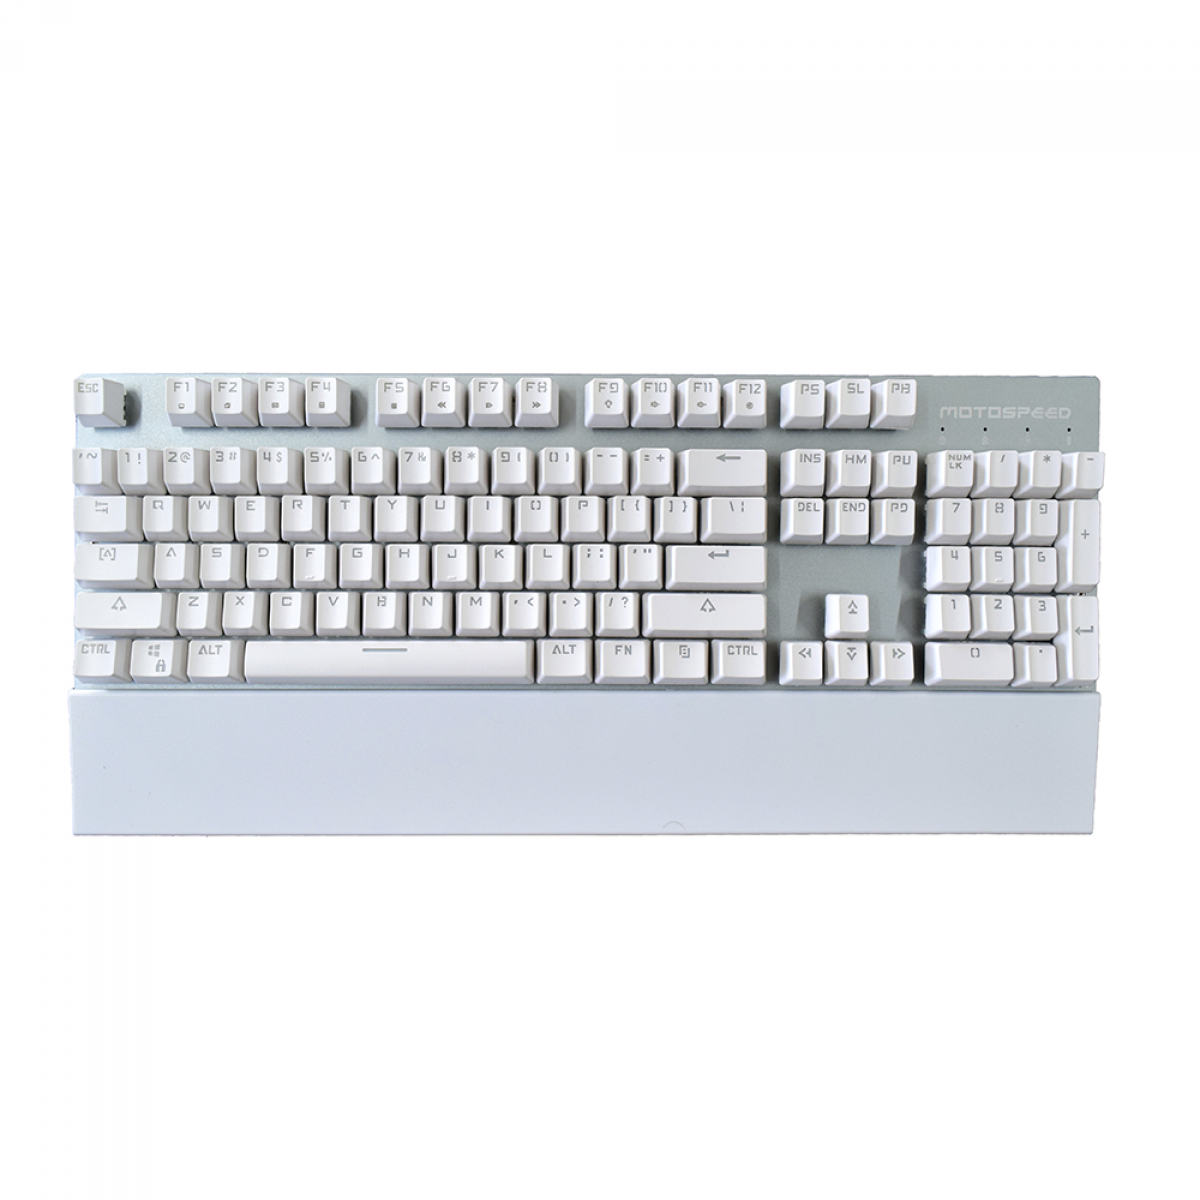 Teclado Mecanico MotoSpeed GK89 White, Wireless, Switch Blue, LED Blue, FMSTC0078BRO